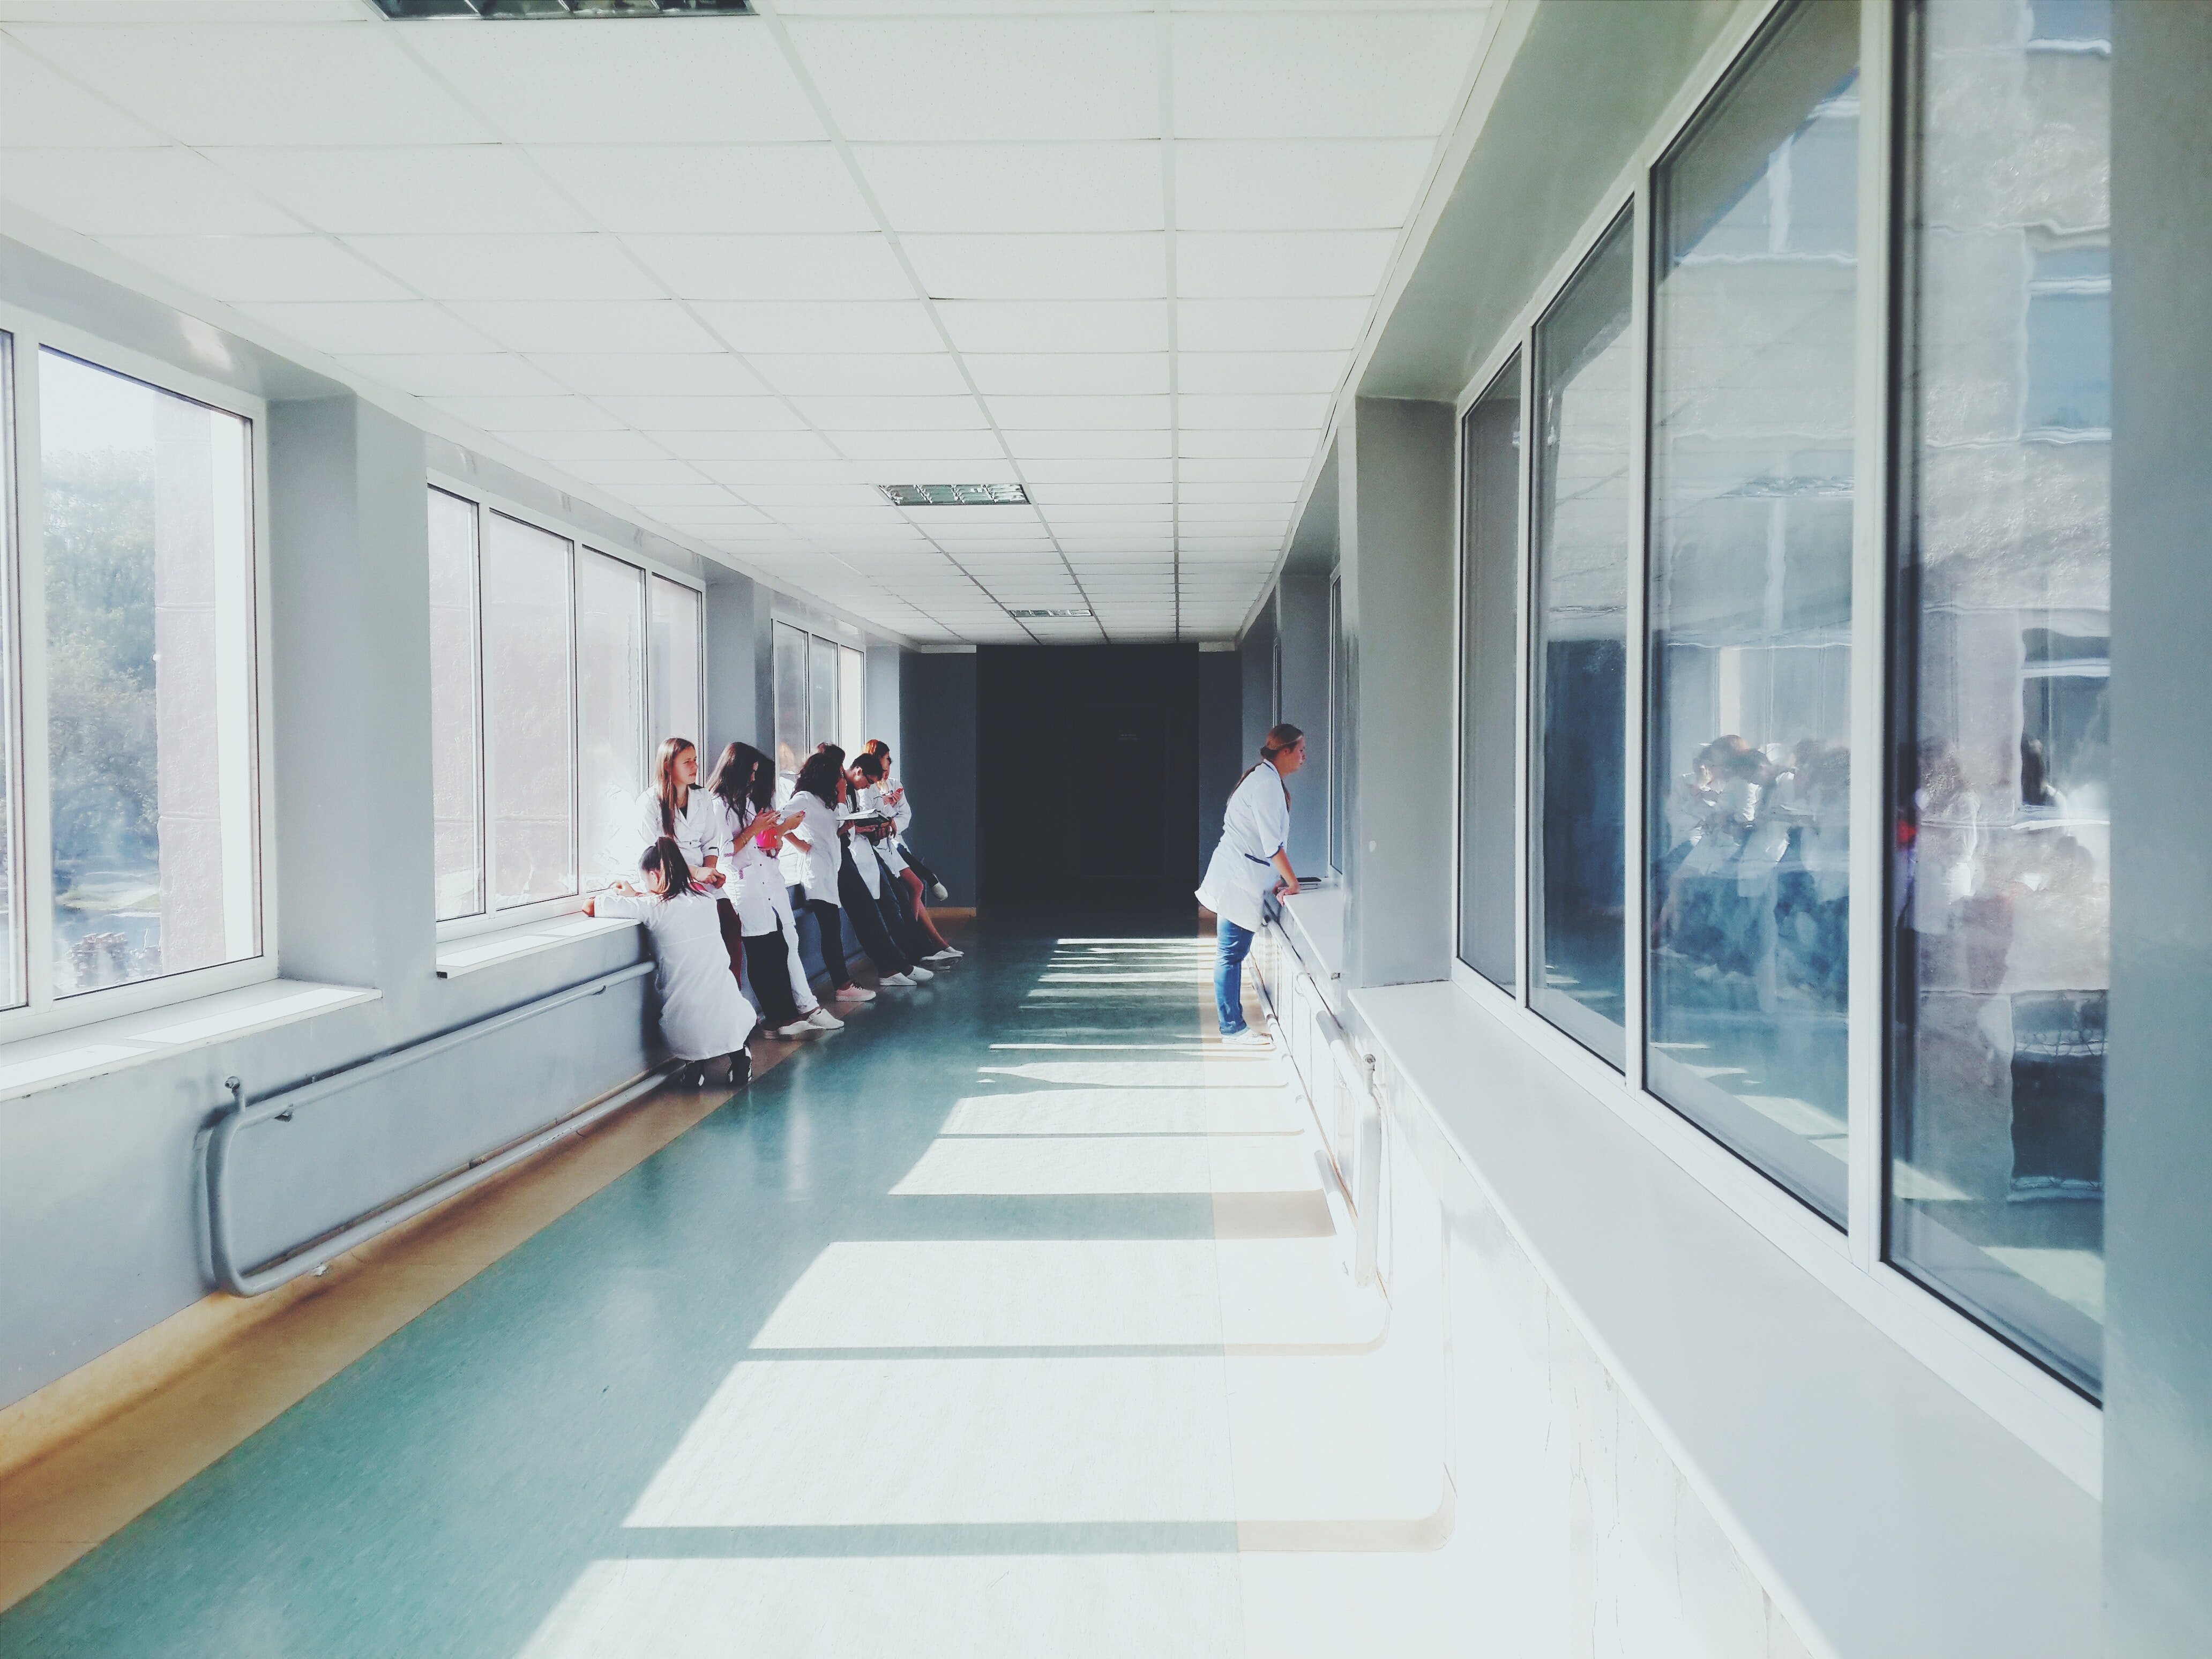 clinic-doctors-glass-127873.jpg